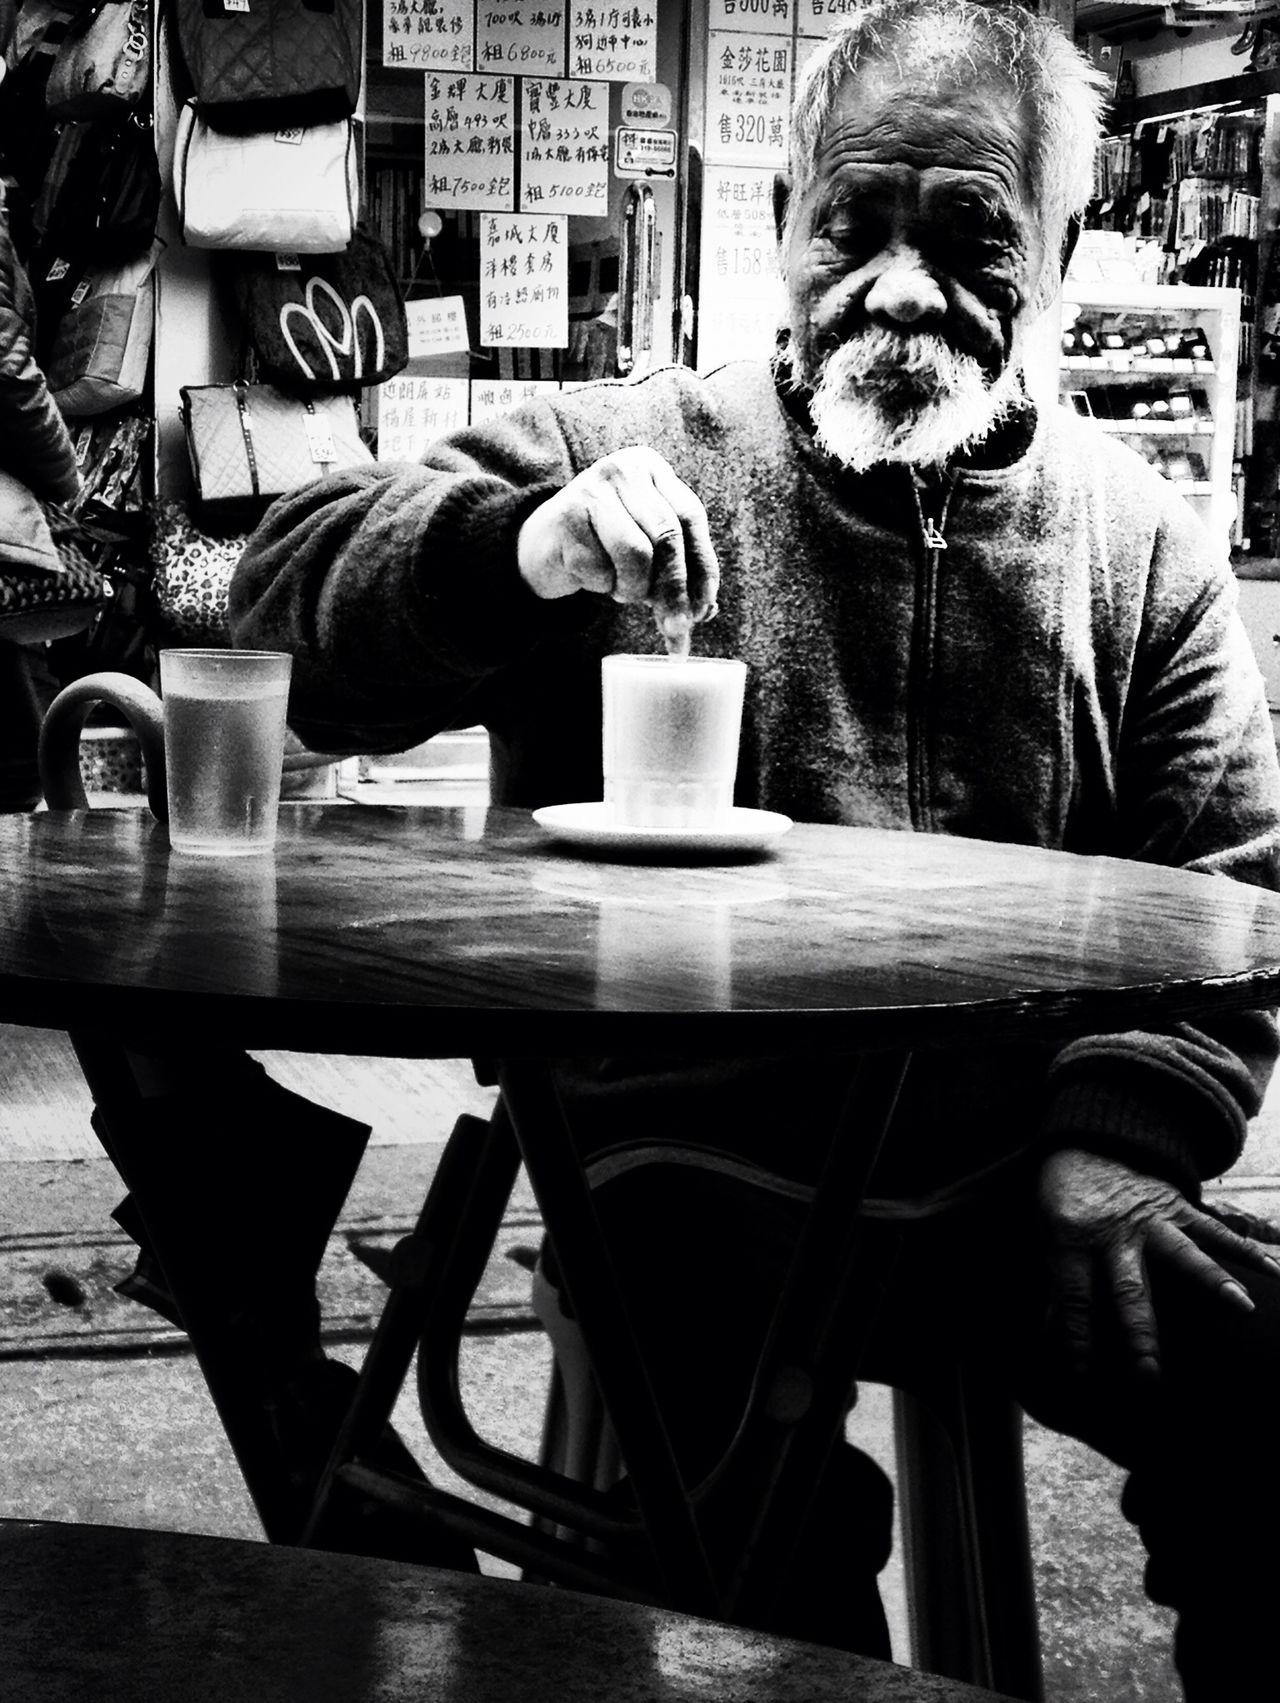 people at 西苑強記咖啡食店 People